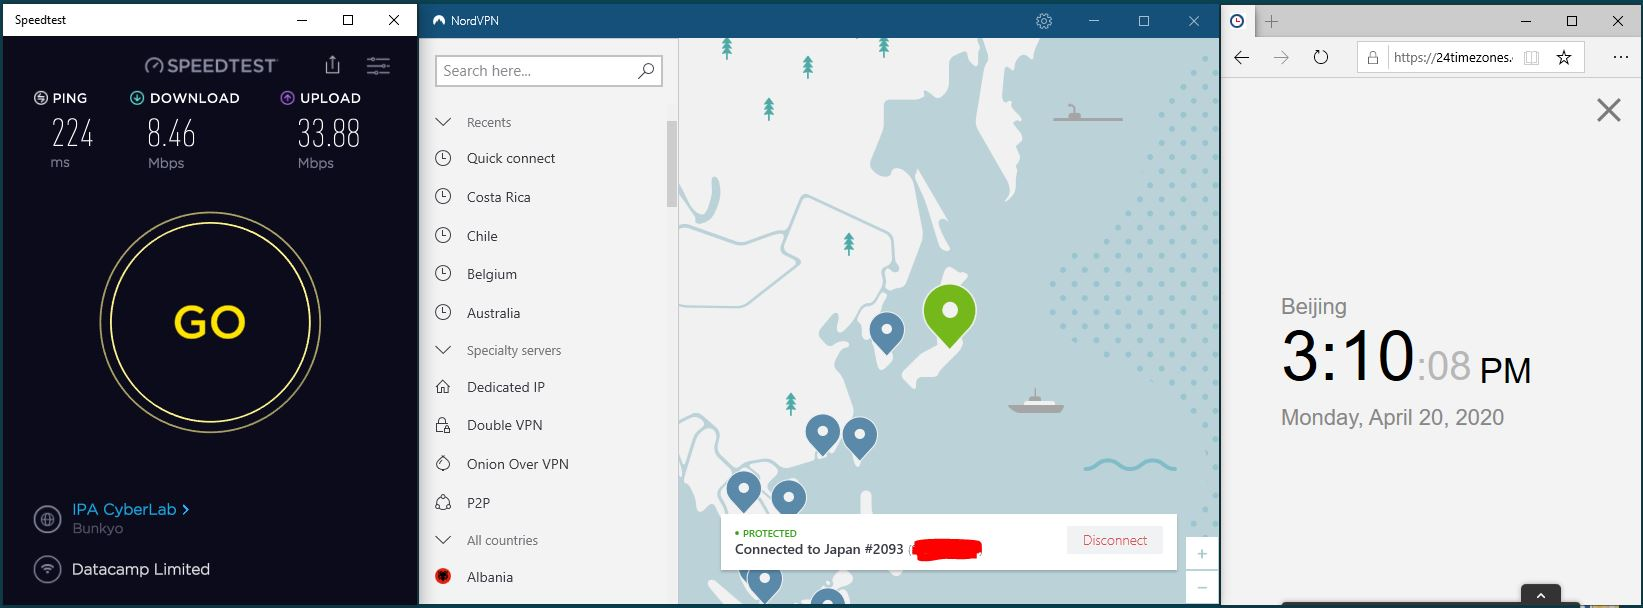 Windows10 NordVPN 混淆协议关闭 Japan #2093 中国VPN 翻墙 科学上网 SpeedTest测速-20200420